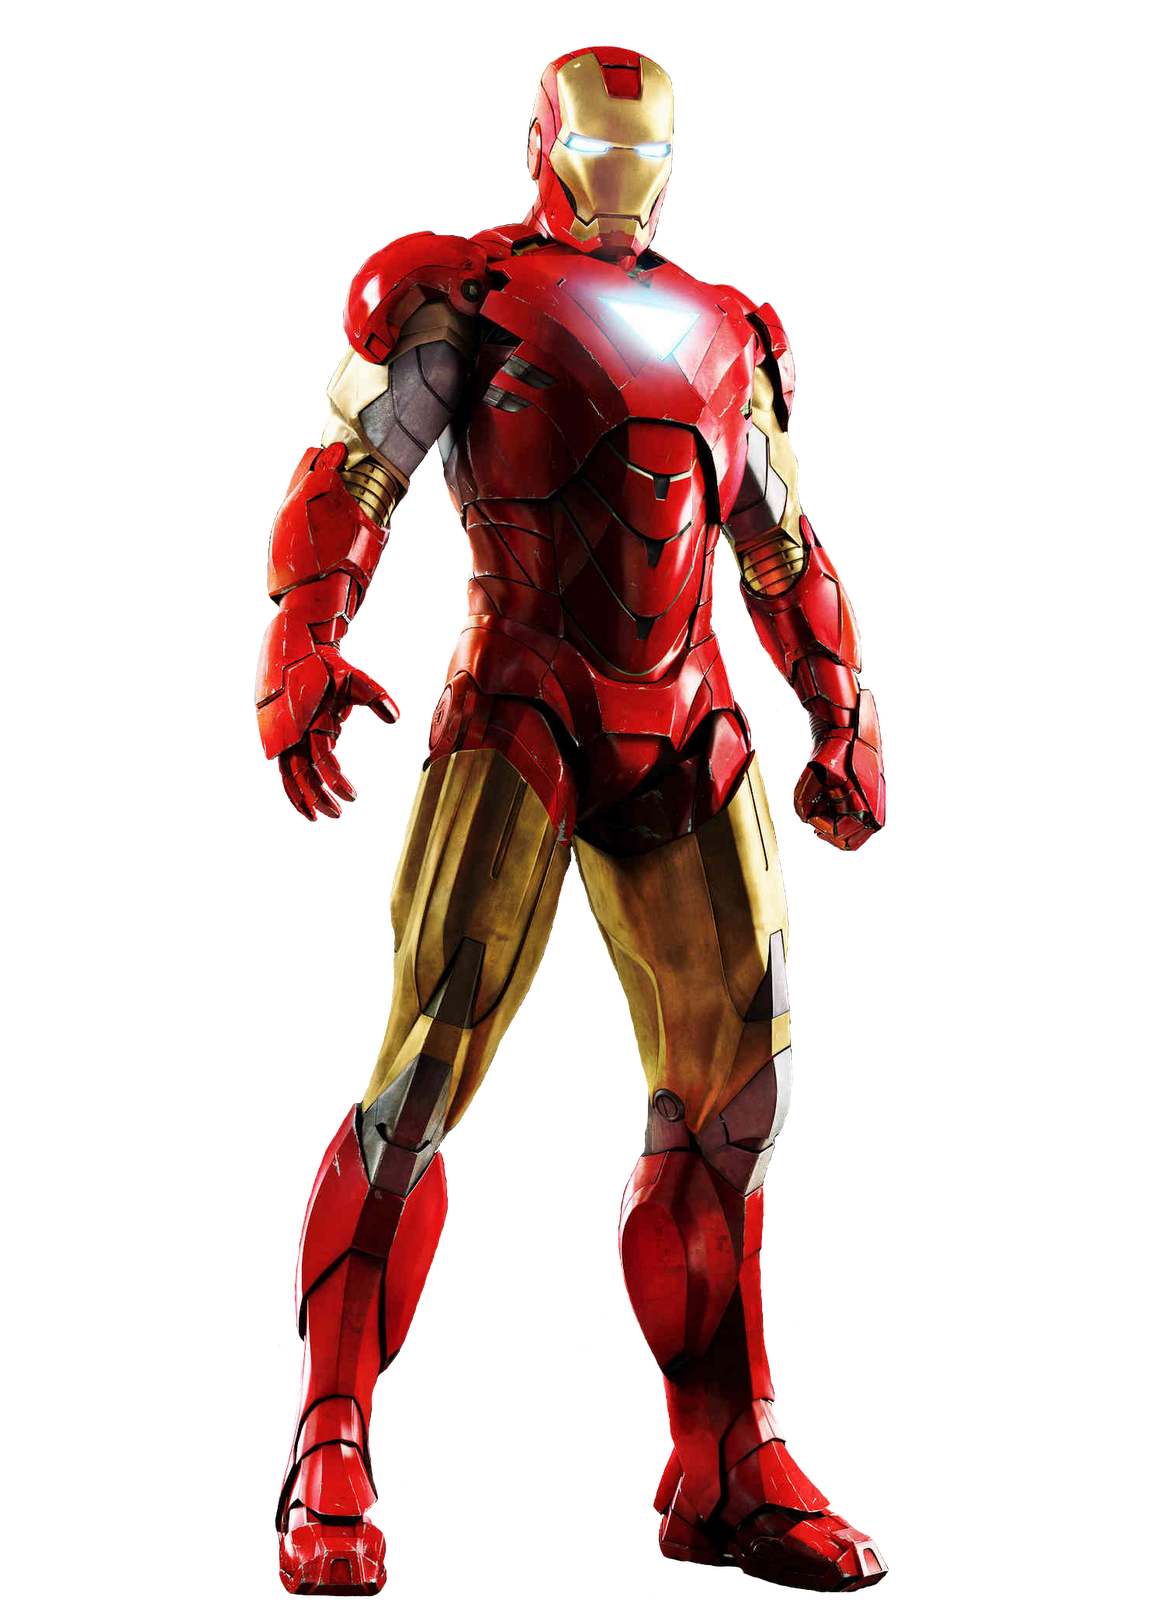 Iron Man 2 Hall of Armor Collection machine de guerre AVENGERS MARVEL UNIVERS MCU